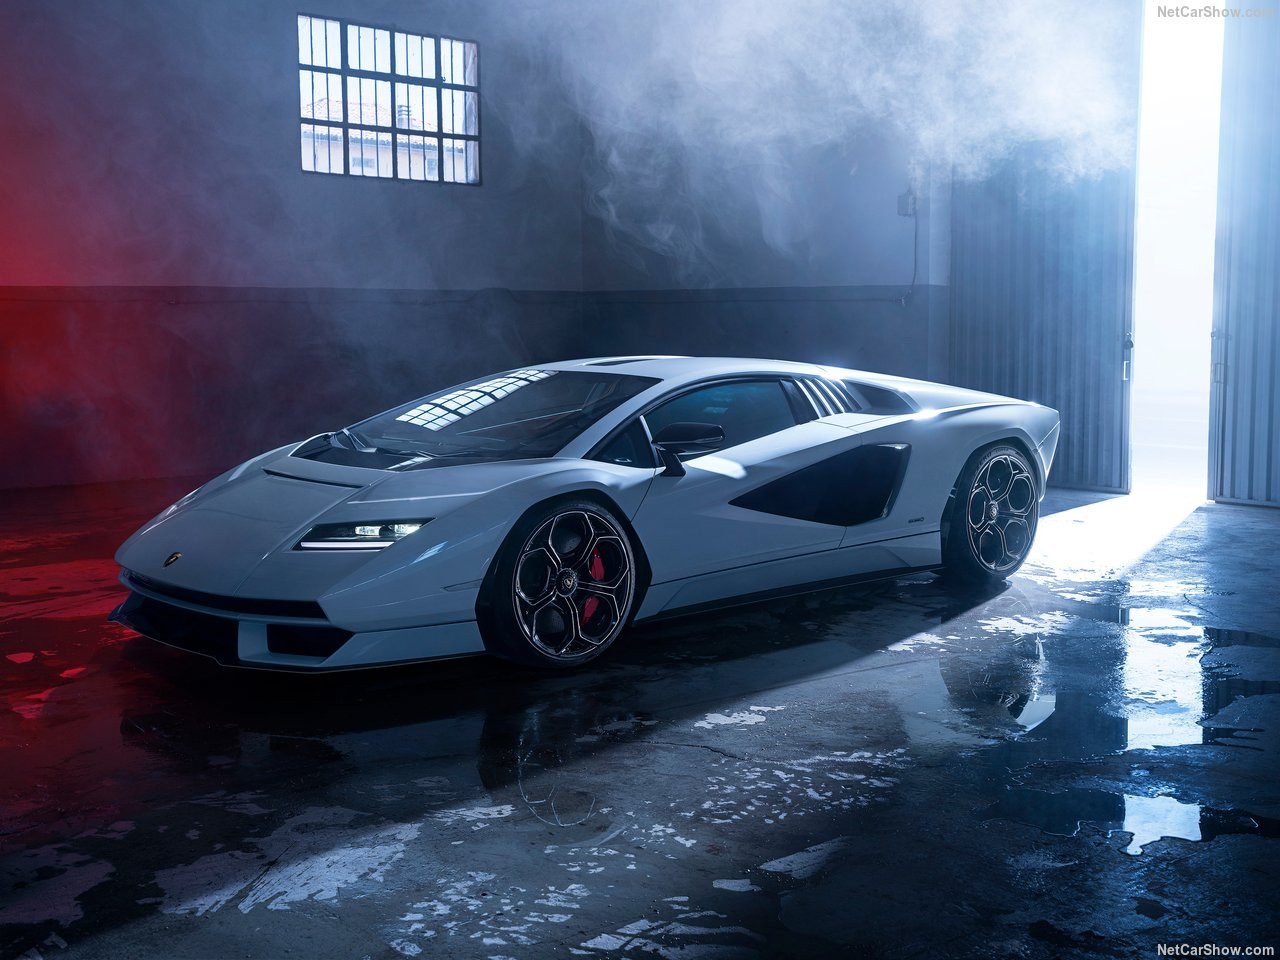 Lamborghini-Countach_LPI_800-4-2022-1280-04.jpg